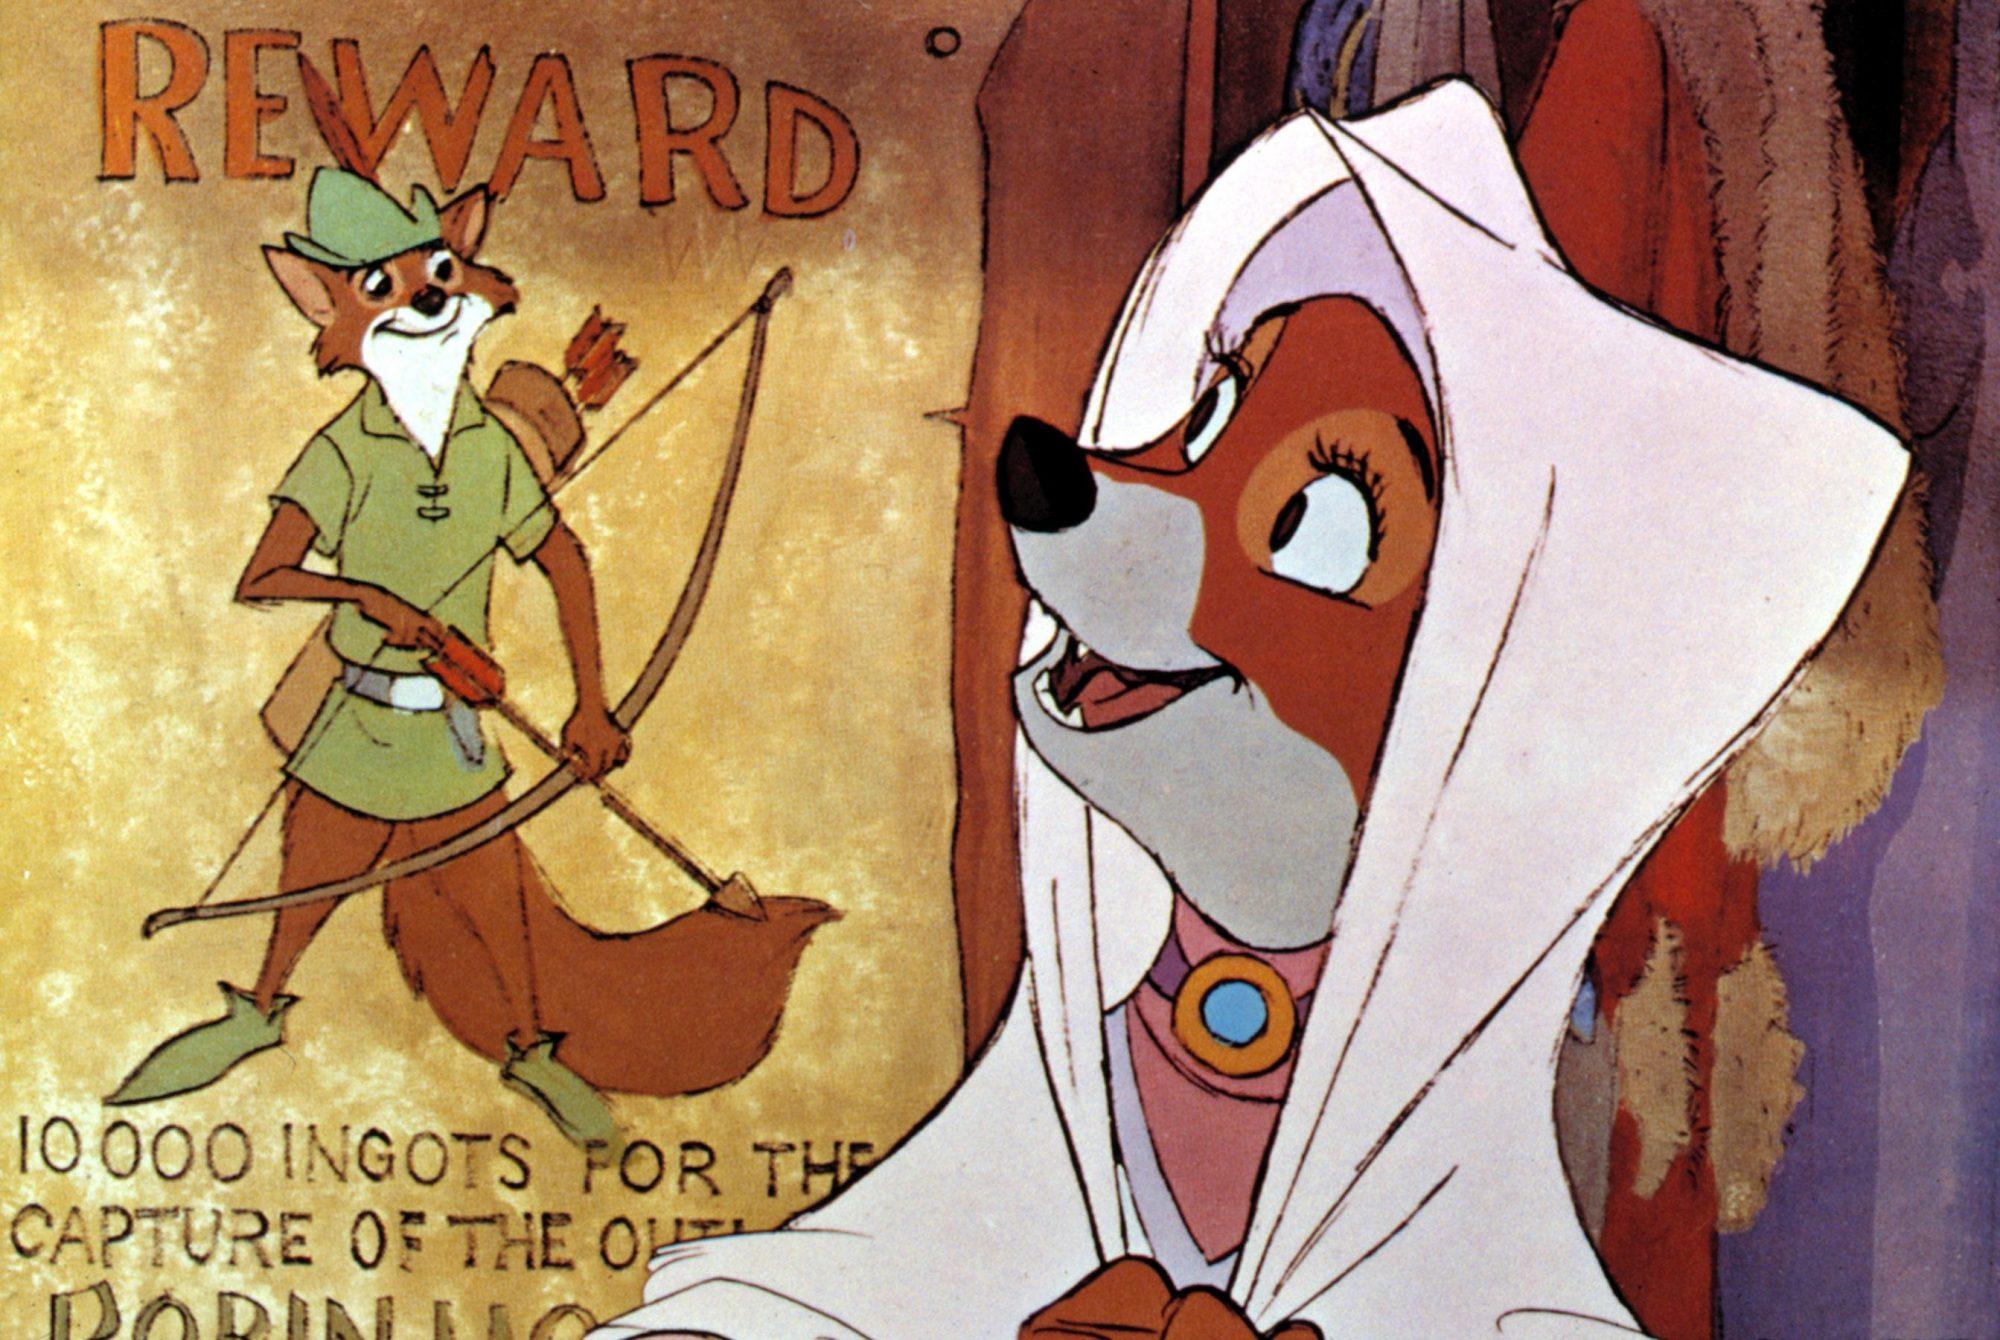 ROBIN HOOD, Walt Disney Production, 1973